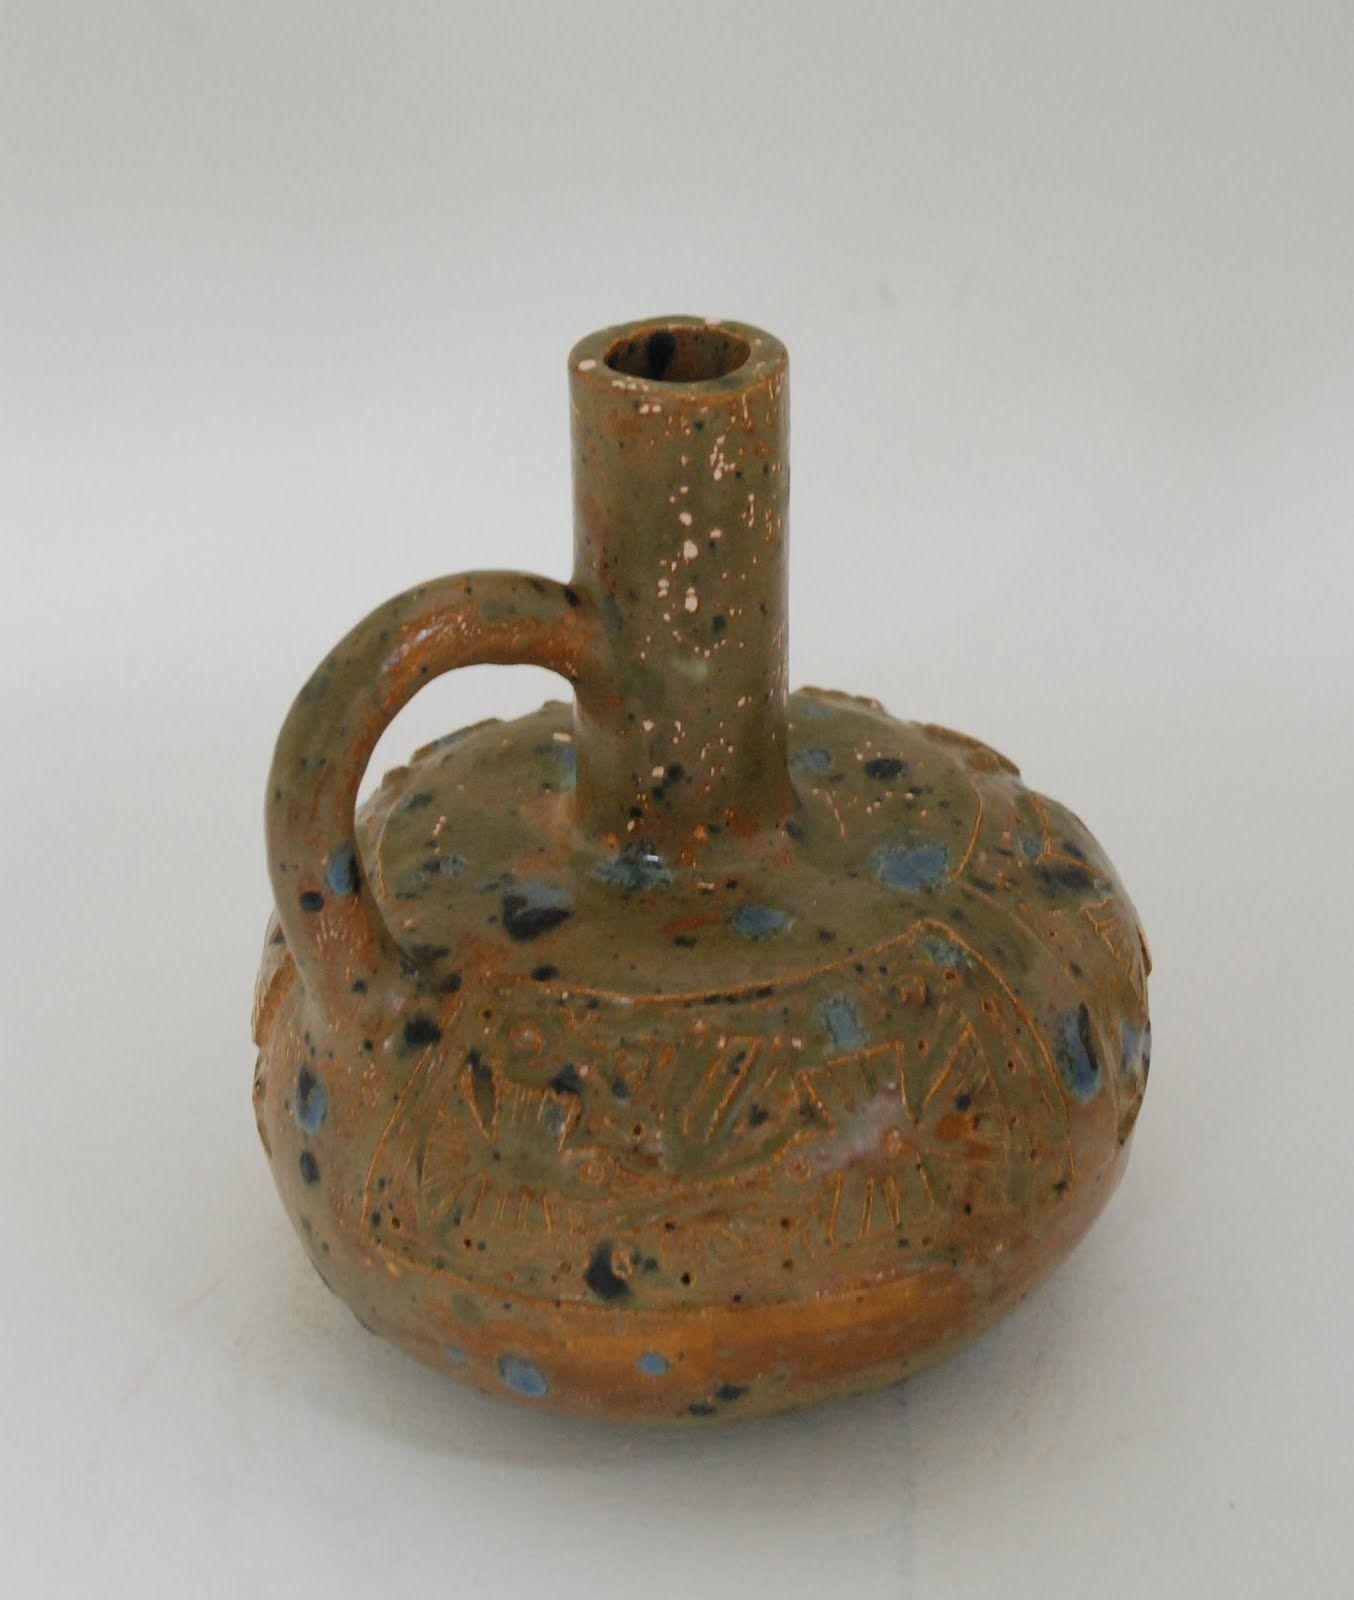 Coil Pottery | Japanese Coil Pots | Pottery | Pinterest ...